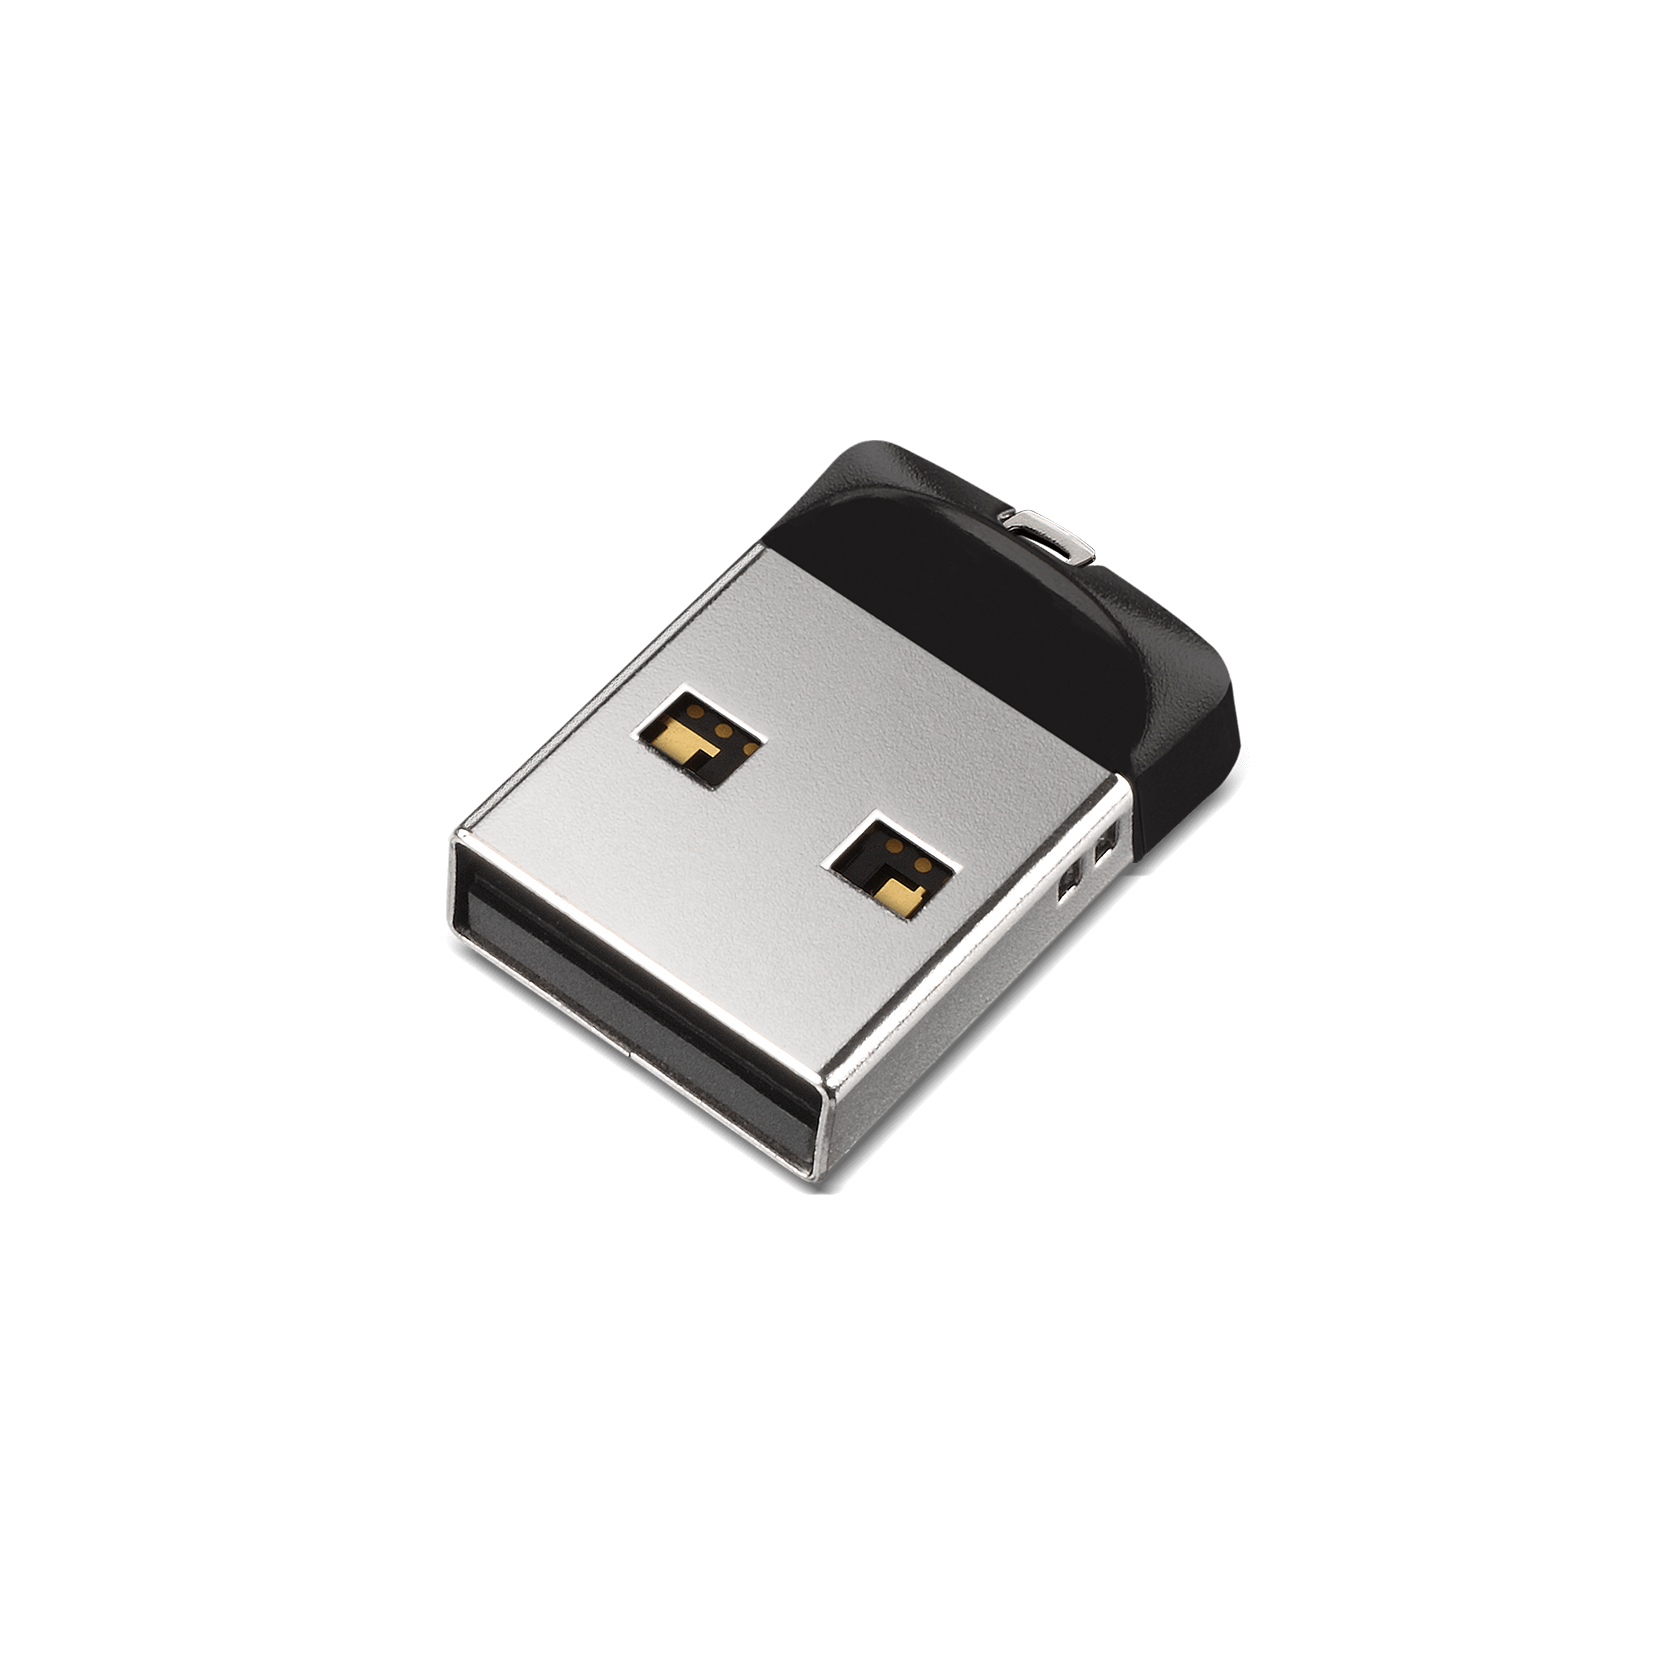 SDCZ33-064G-B35 SanDisk Cruzer Fit 64GB USB 2.0 Low-Profile Flash Drive